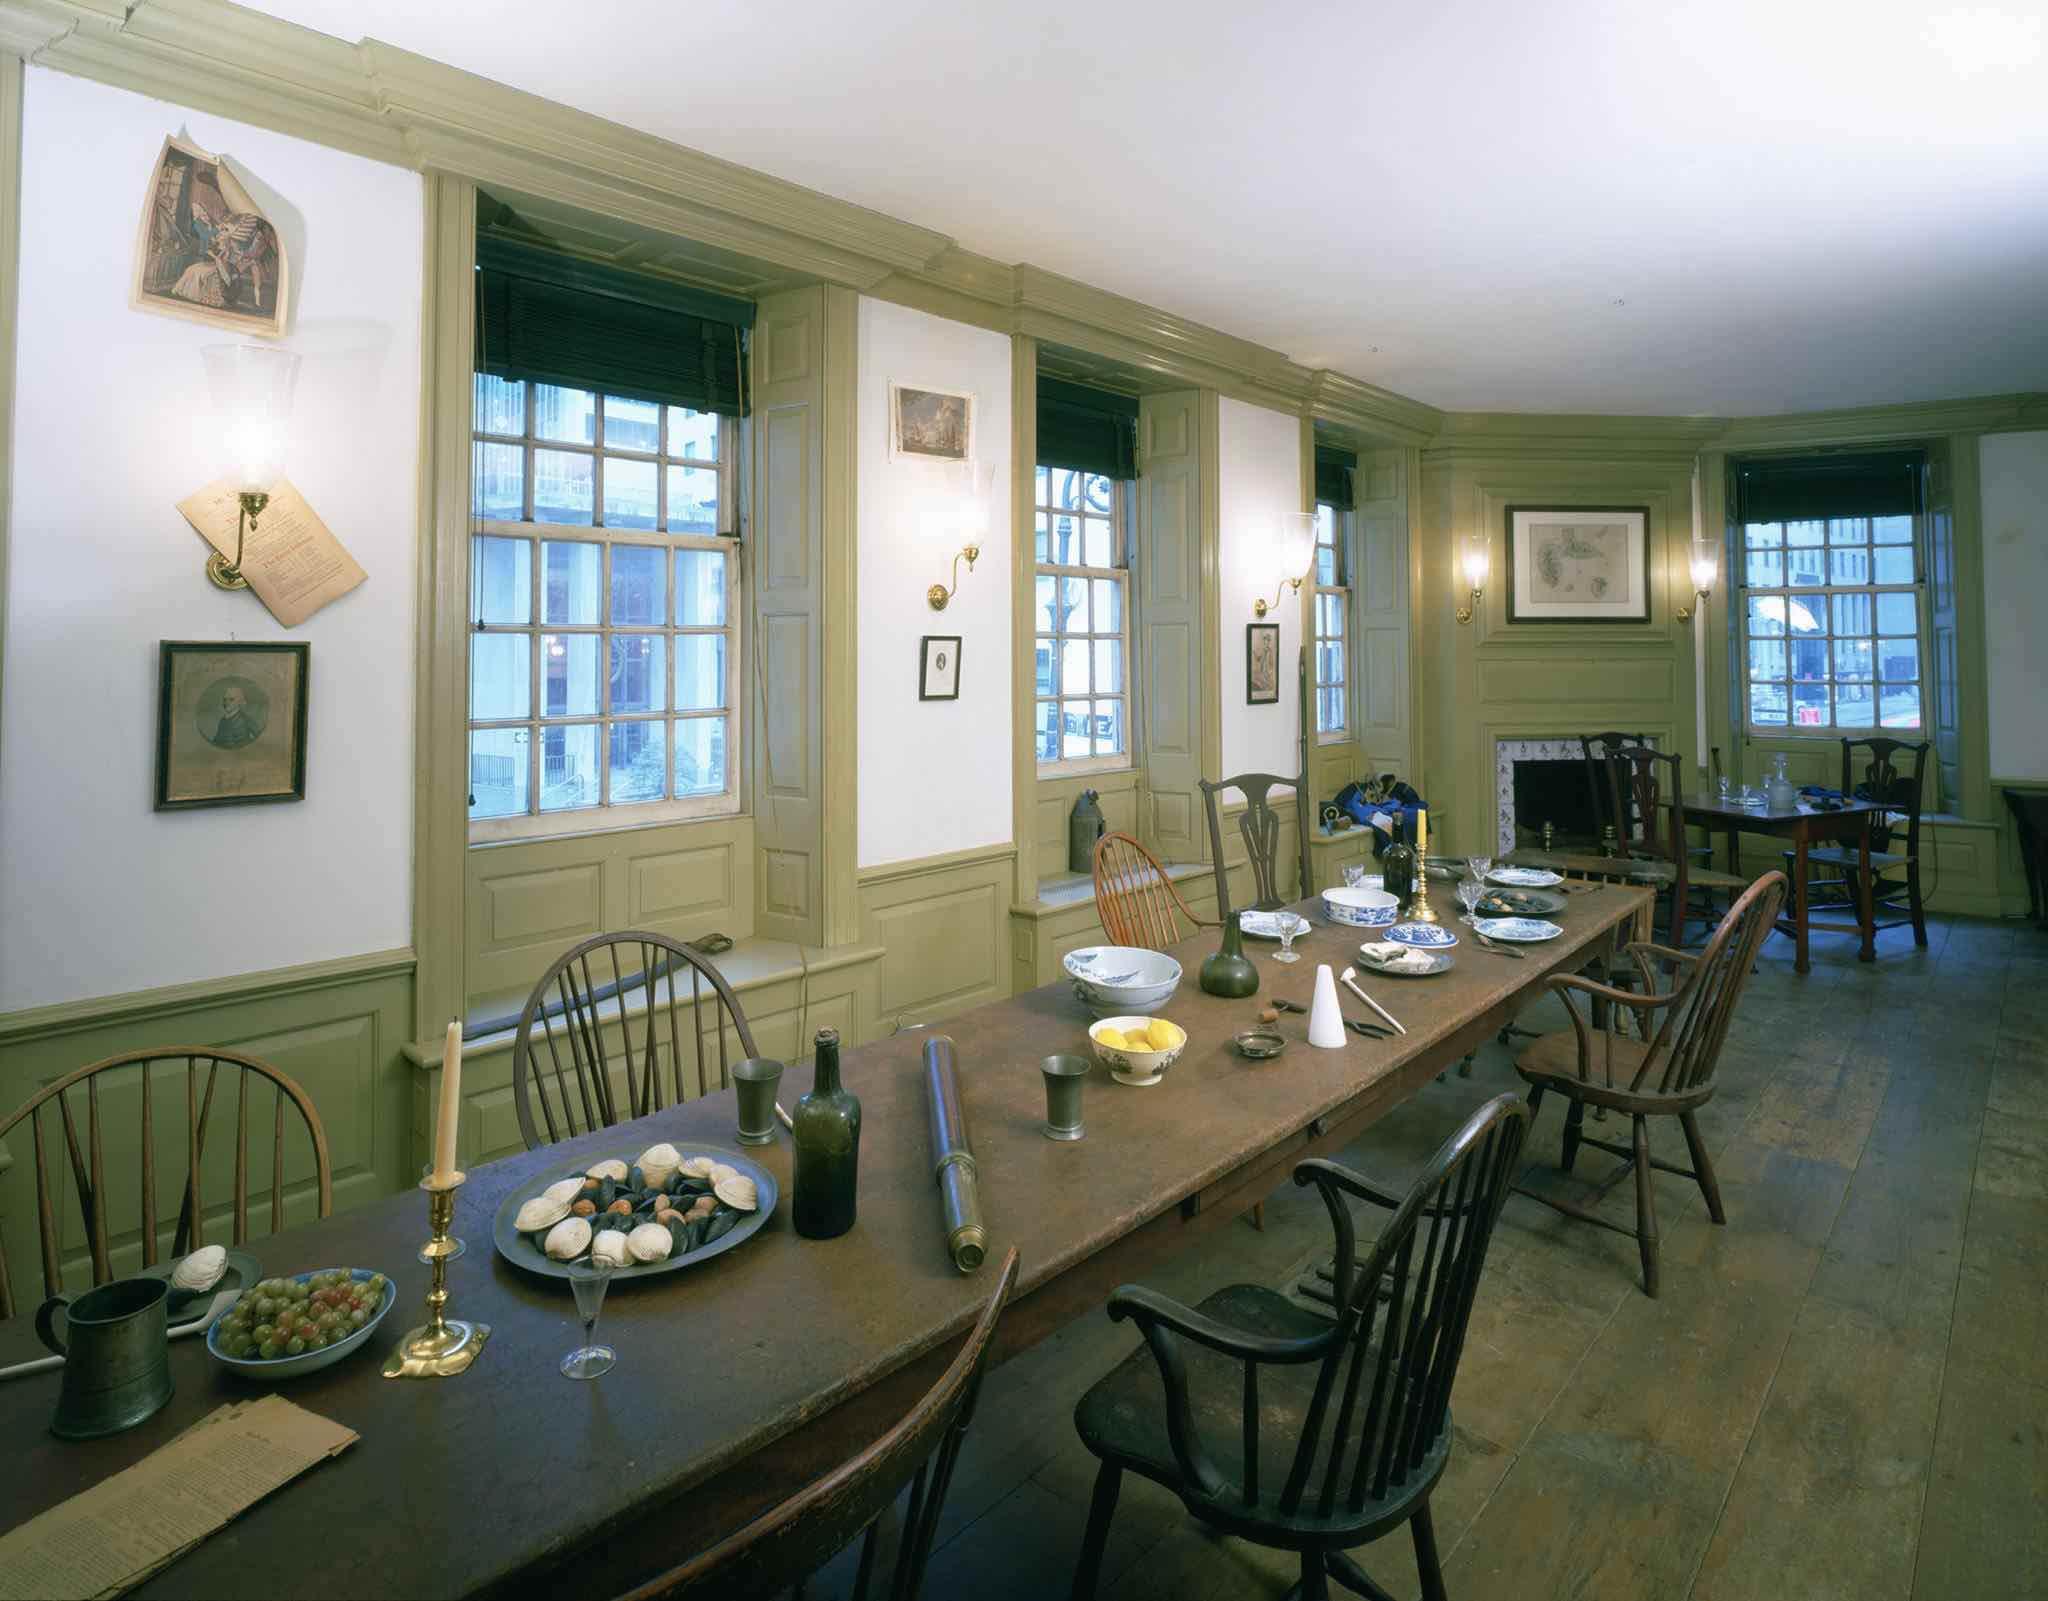 2/Fraunces Tavern Museum